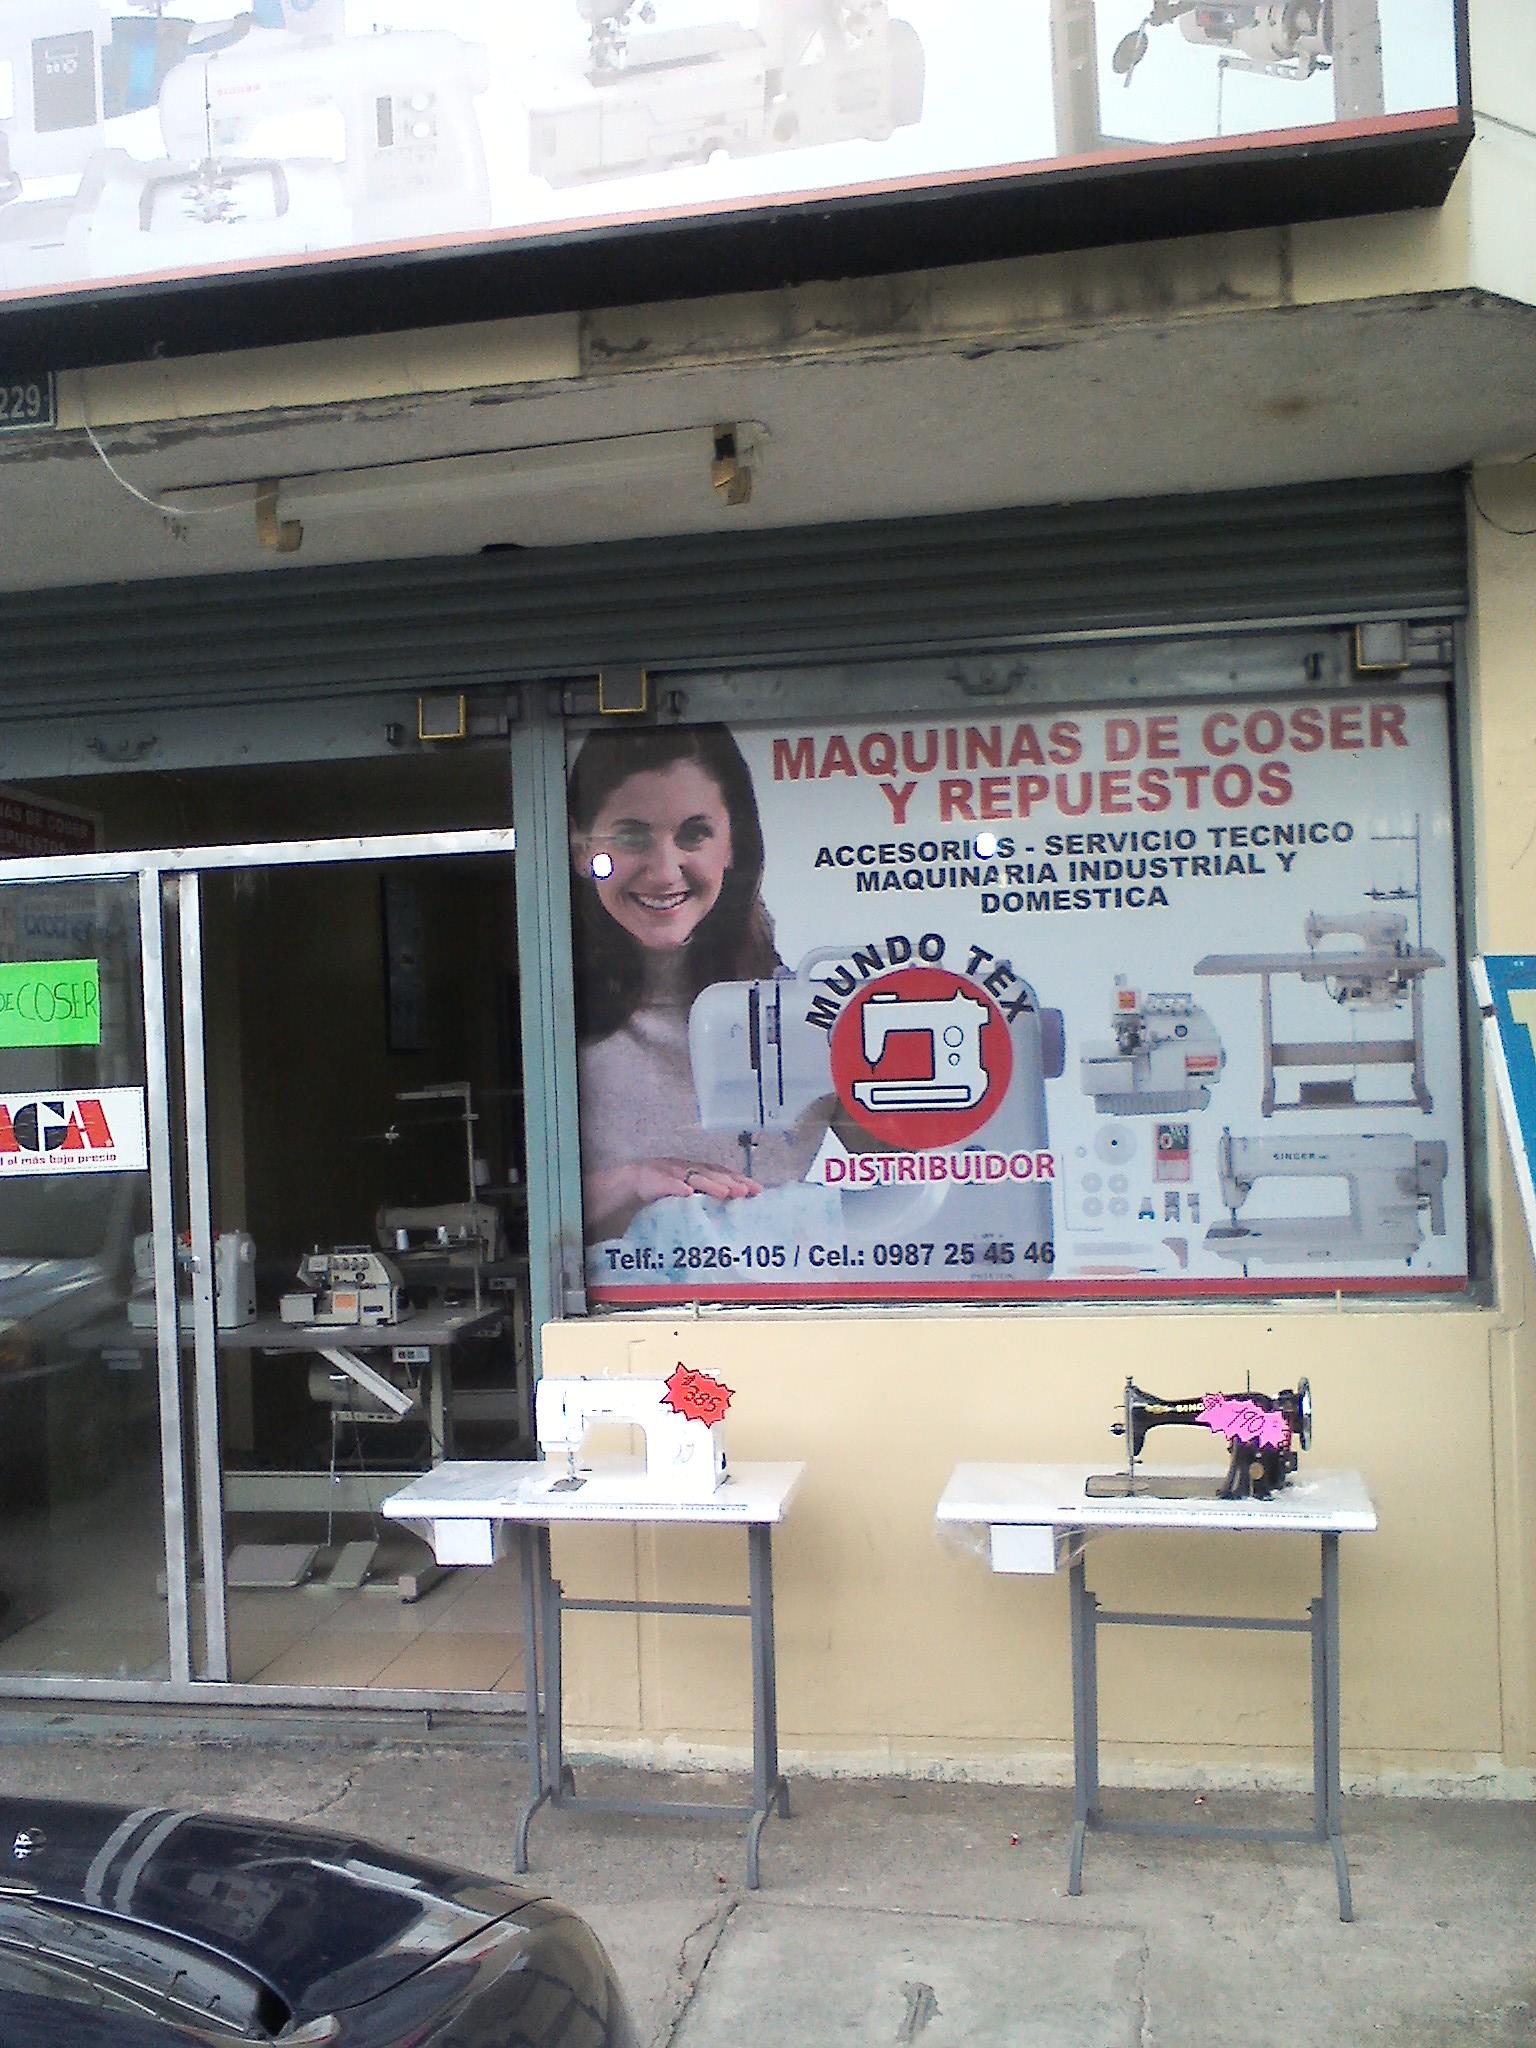 Maquinas de Coser en Quito